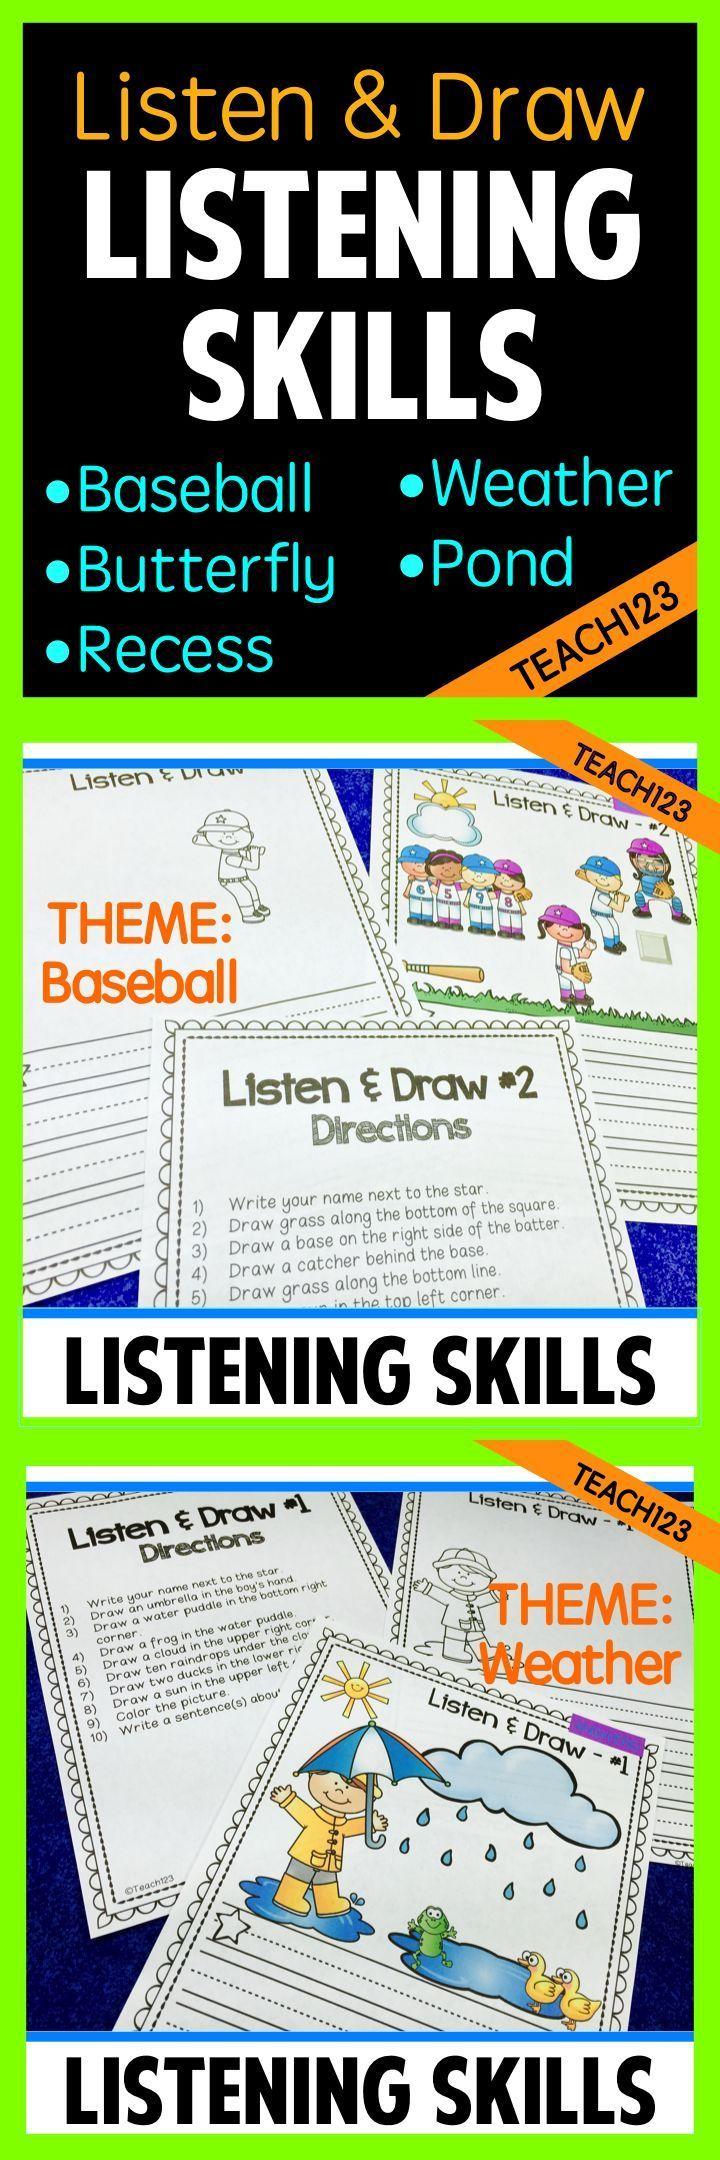 Best 25+ Listening skills ideas on Pinterest | Effective ...